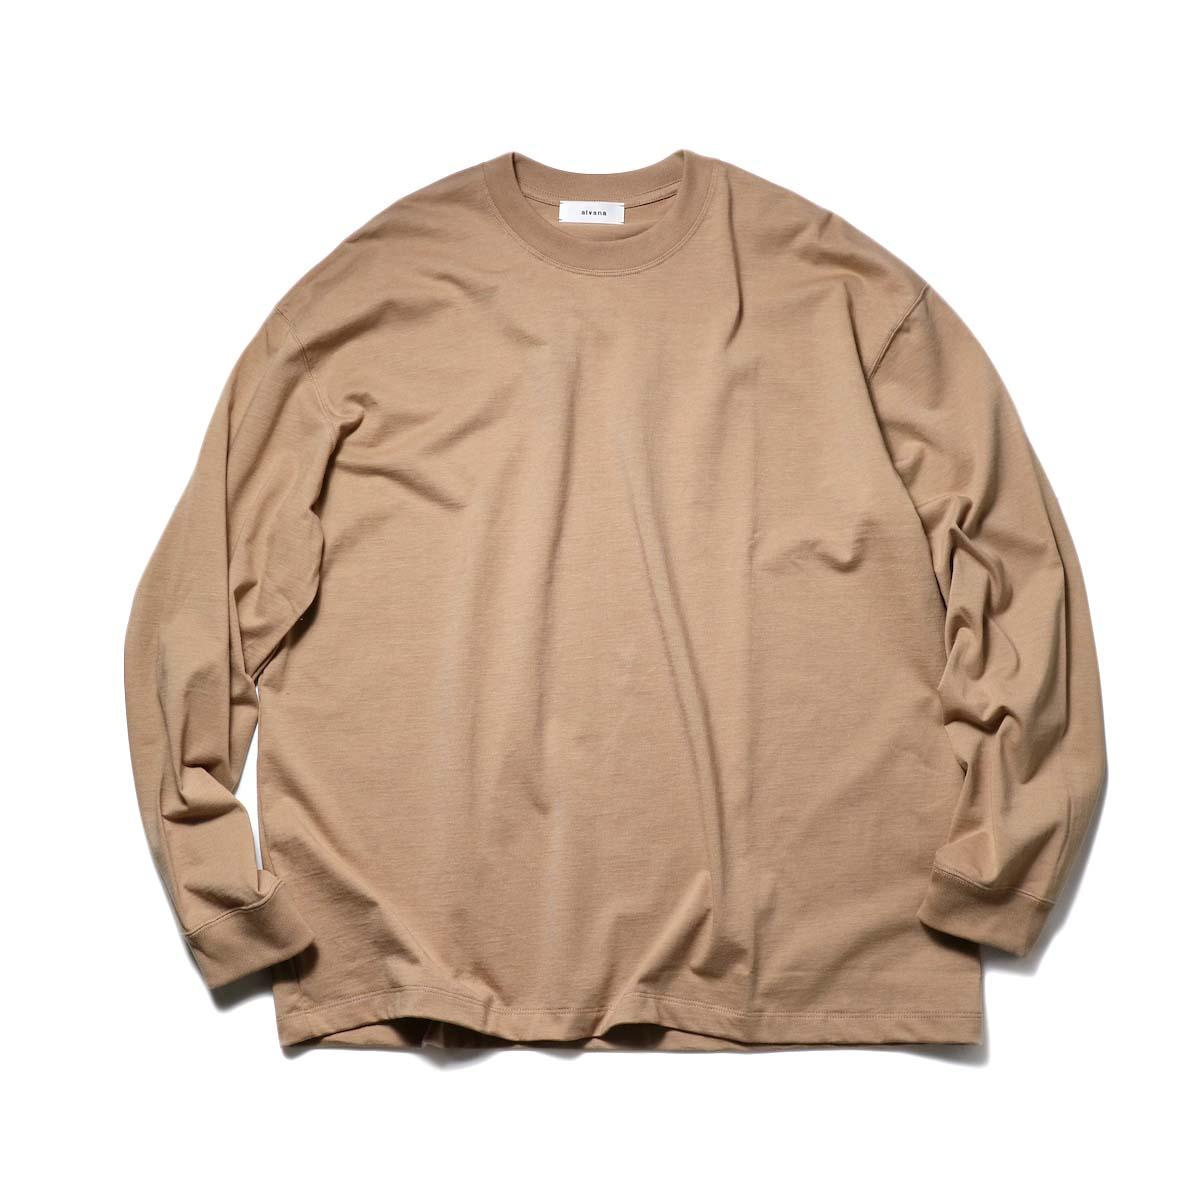 alvana / TANGUIS L/S TEE SHIRTS (Light Brown)正面